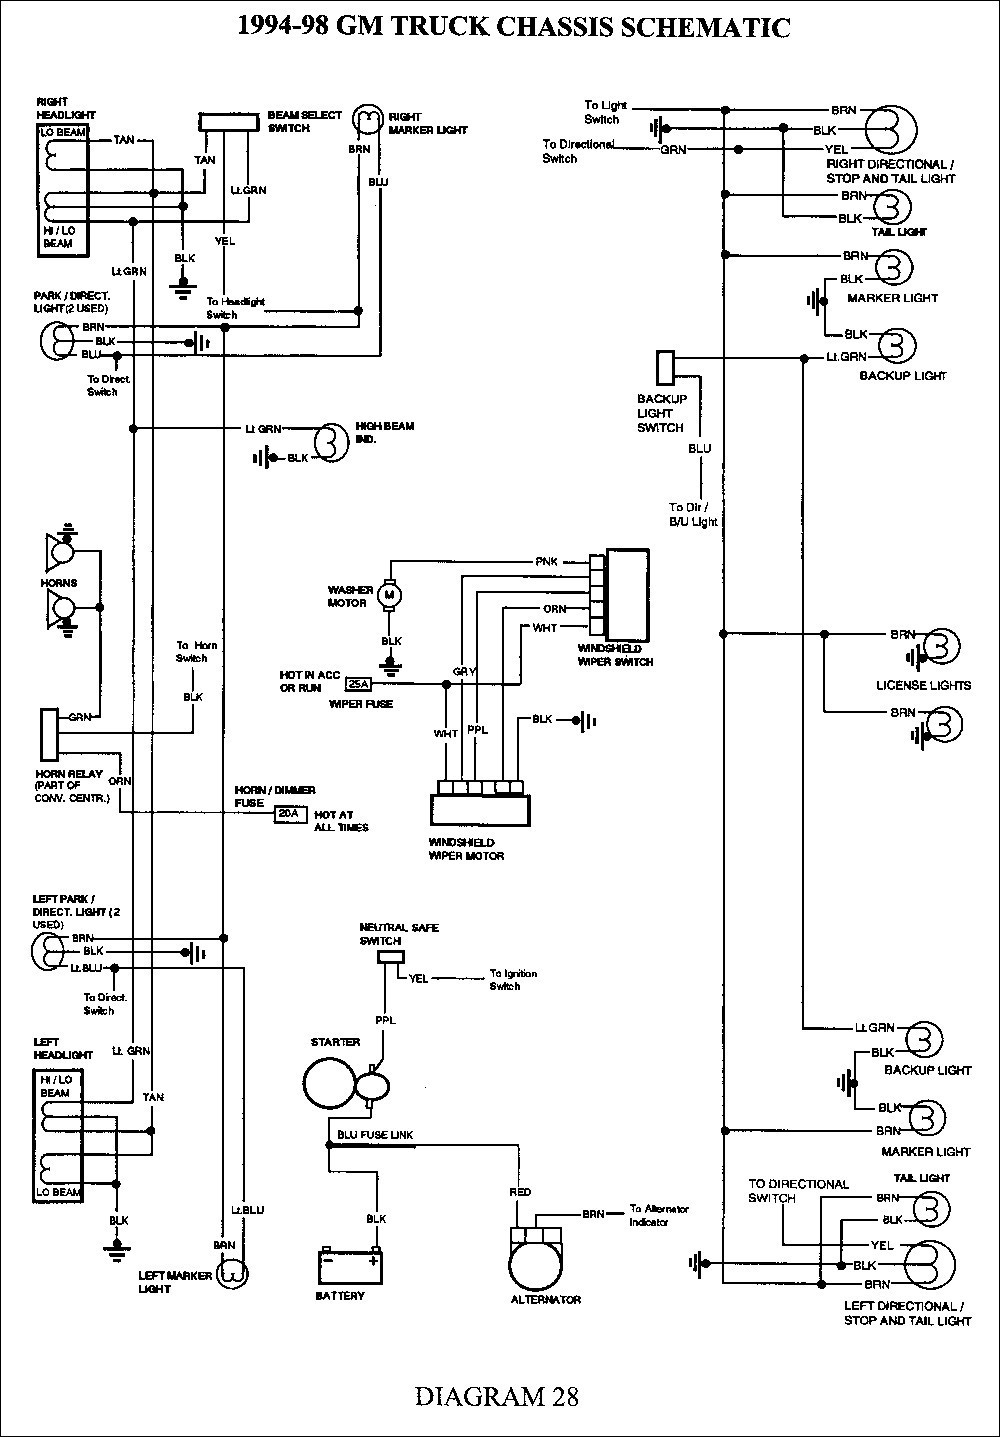 1999 Chevy Silverado Light Wiring Diagram